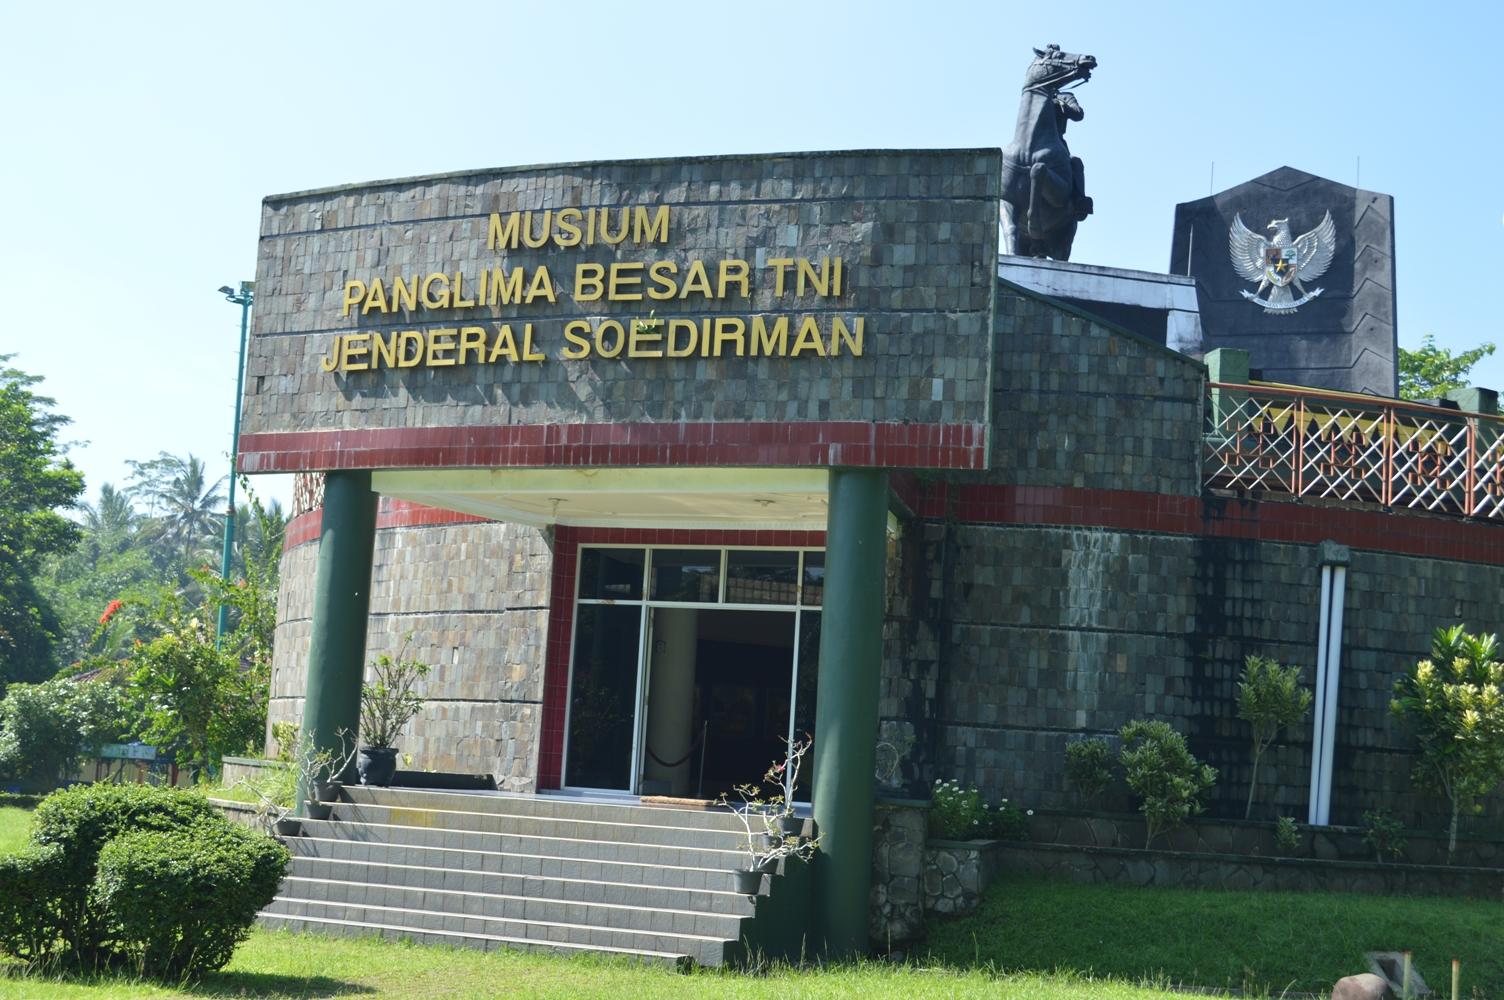 Diorama Mejadikan Museum Soedirman Purwokerto Semakin Menarik Kabupaten Banyumas Panglima